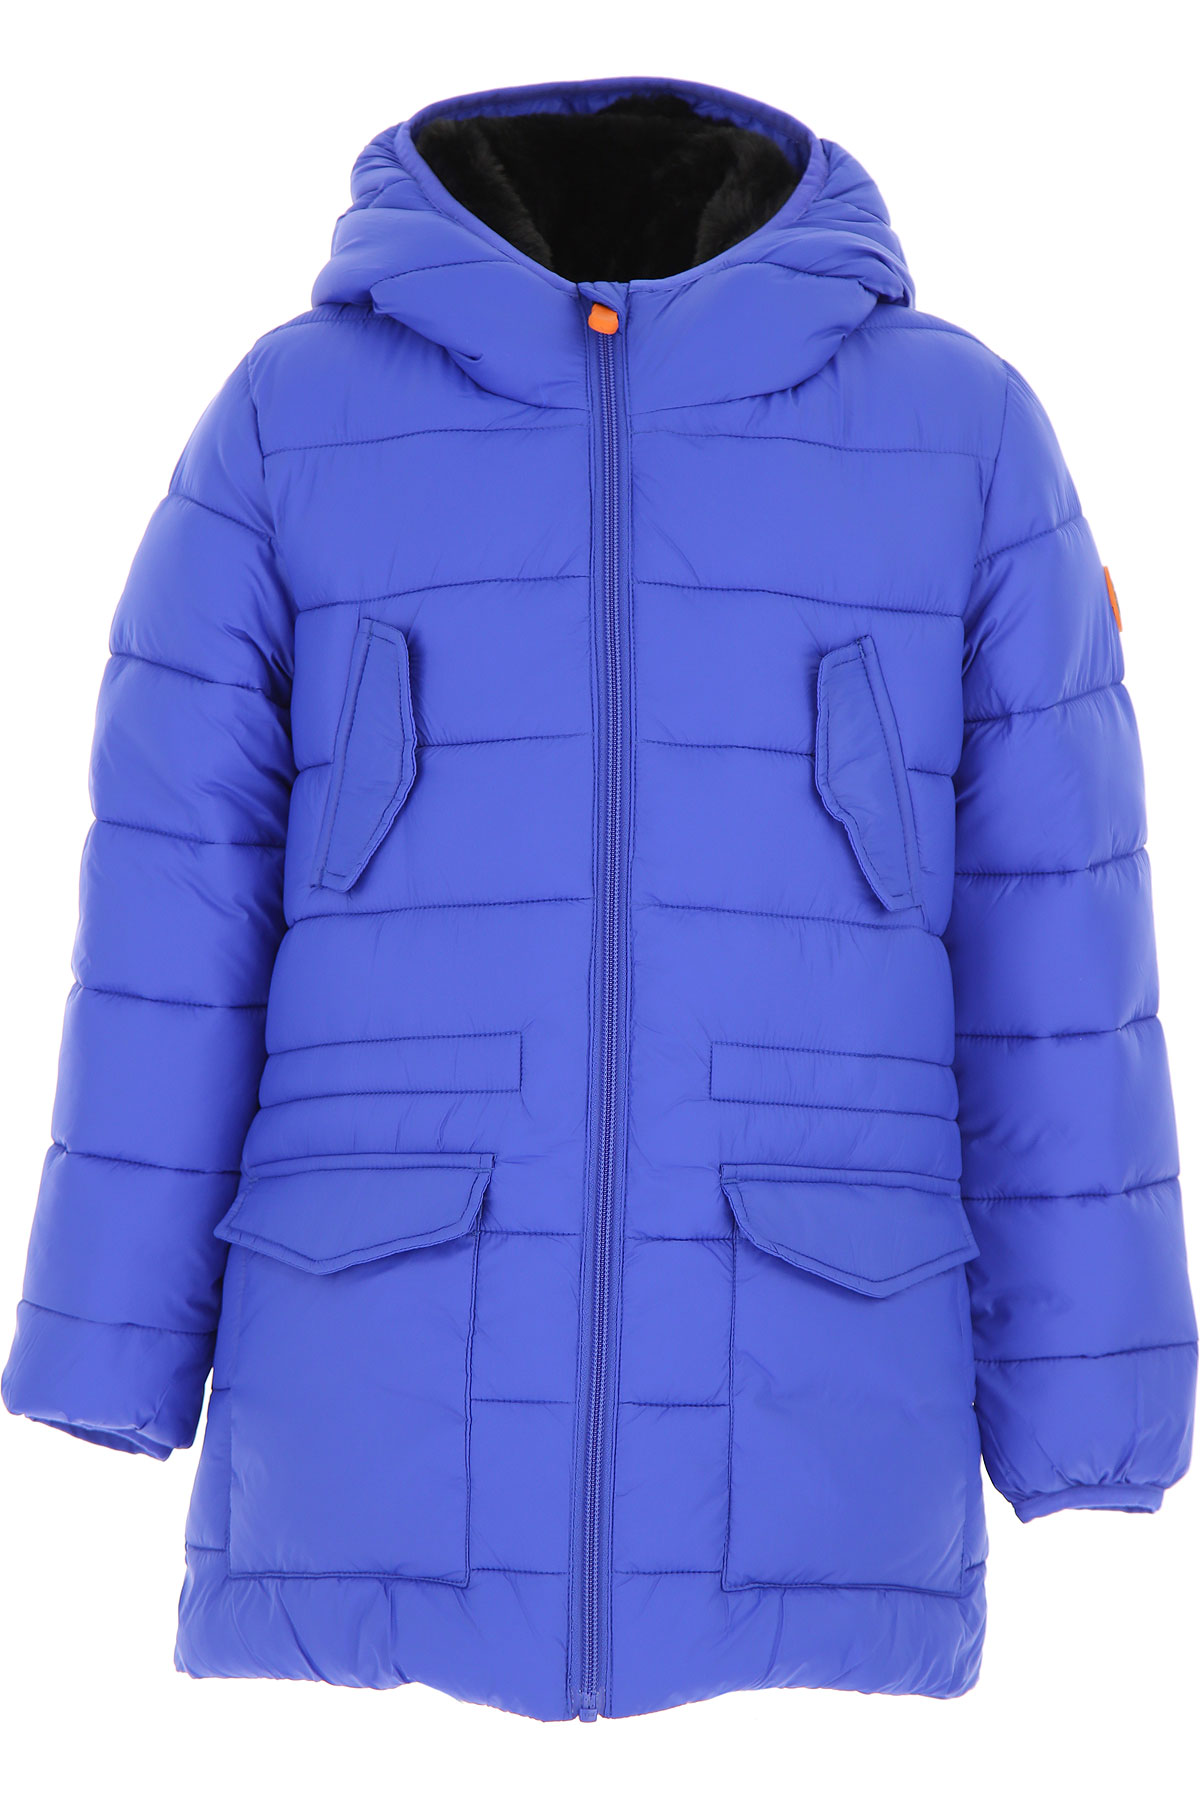 Image of Save the Duck Boys Down Jacket for Kids, Puffer Ski Jacket, Blue, Nylon, 2017, 10Y 14Y 16Y 2Y 4Y 6Y 8Y